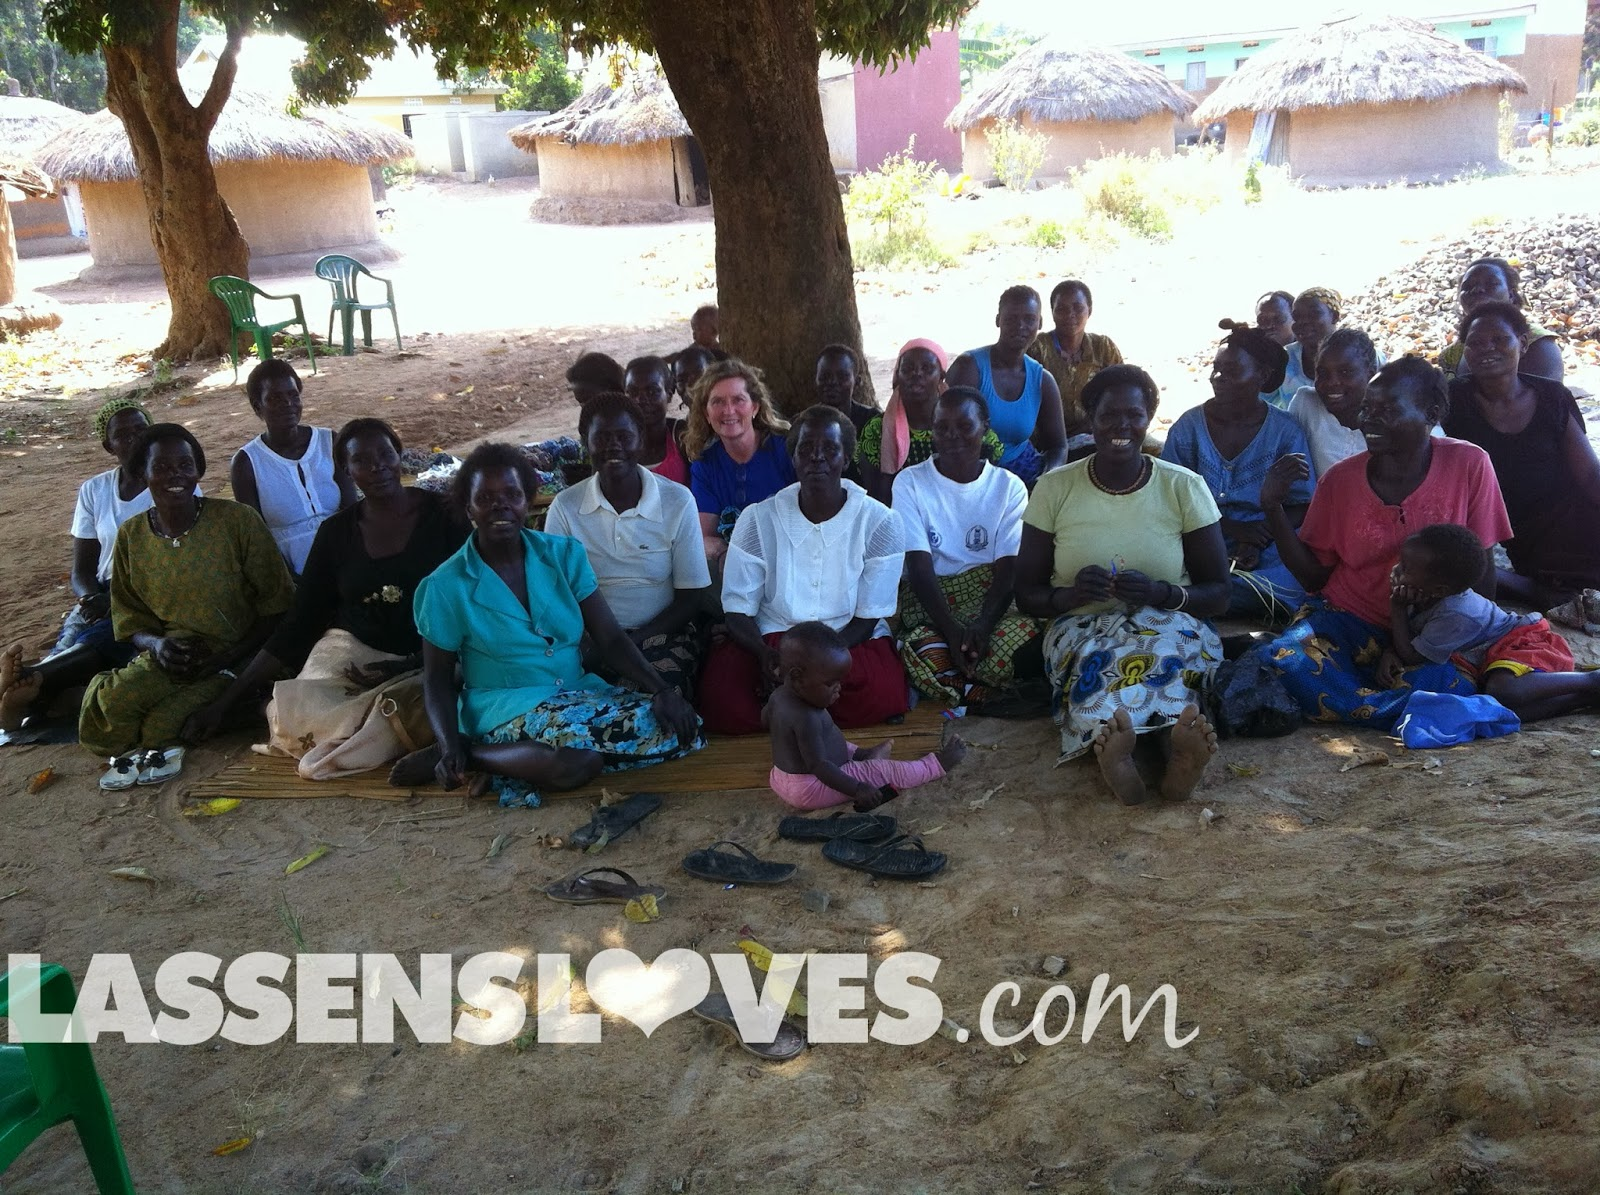 lassensloves.com, Lassen's, Beads+of+Hope, Women+of+Peace, Gulu+Uganda